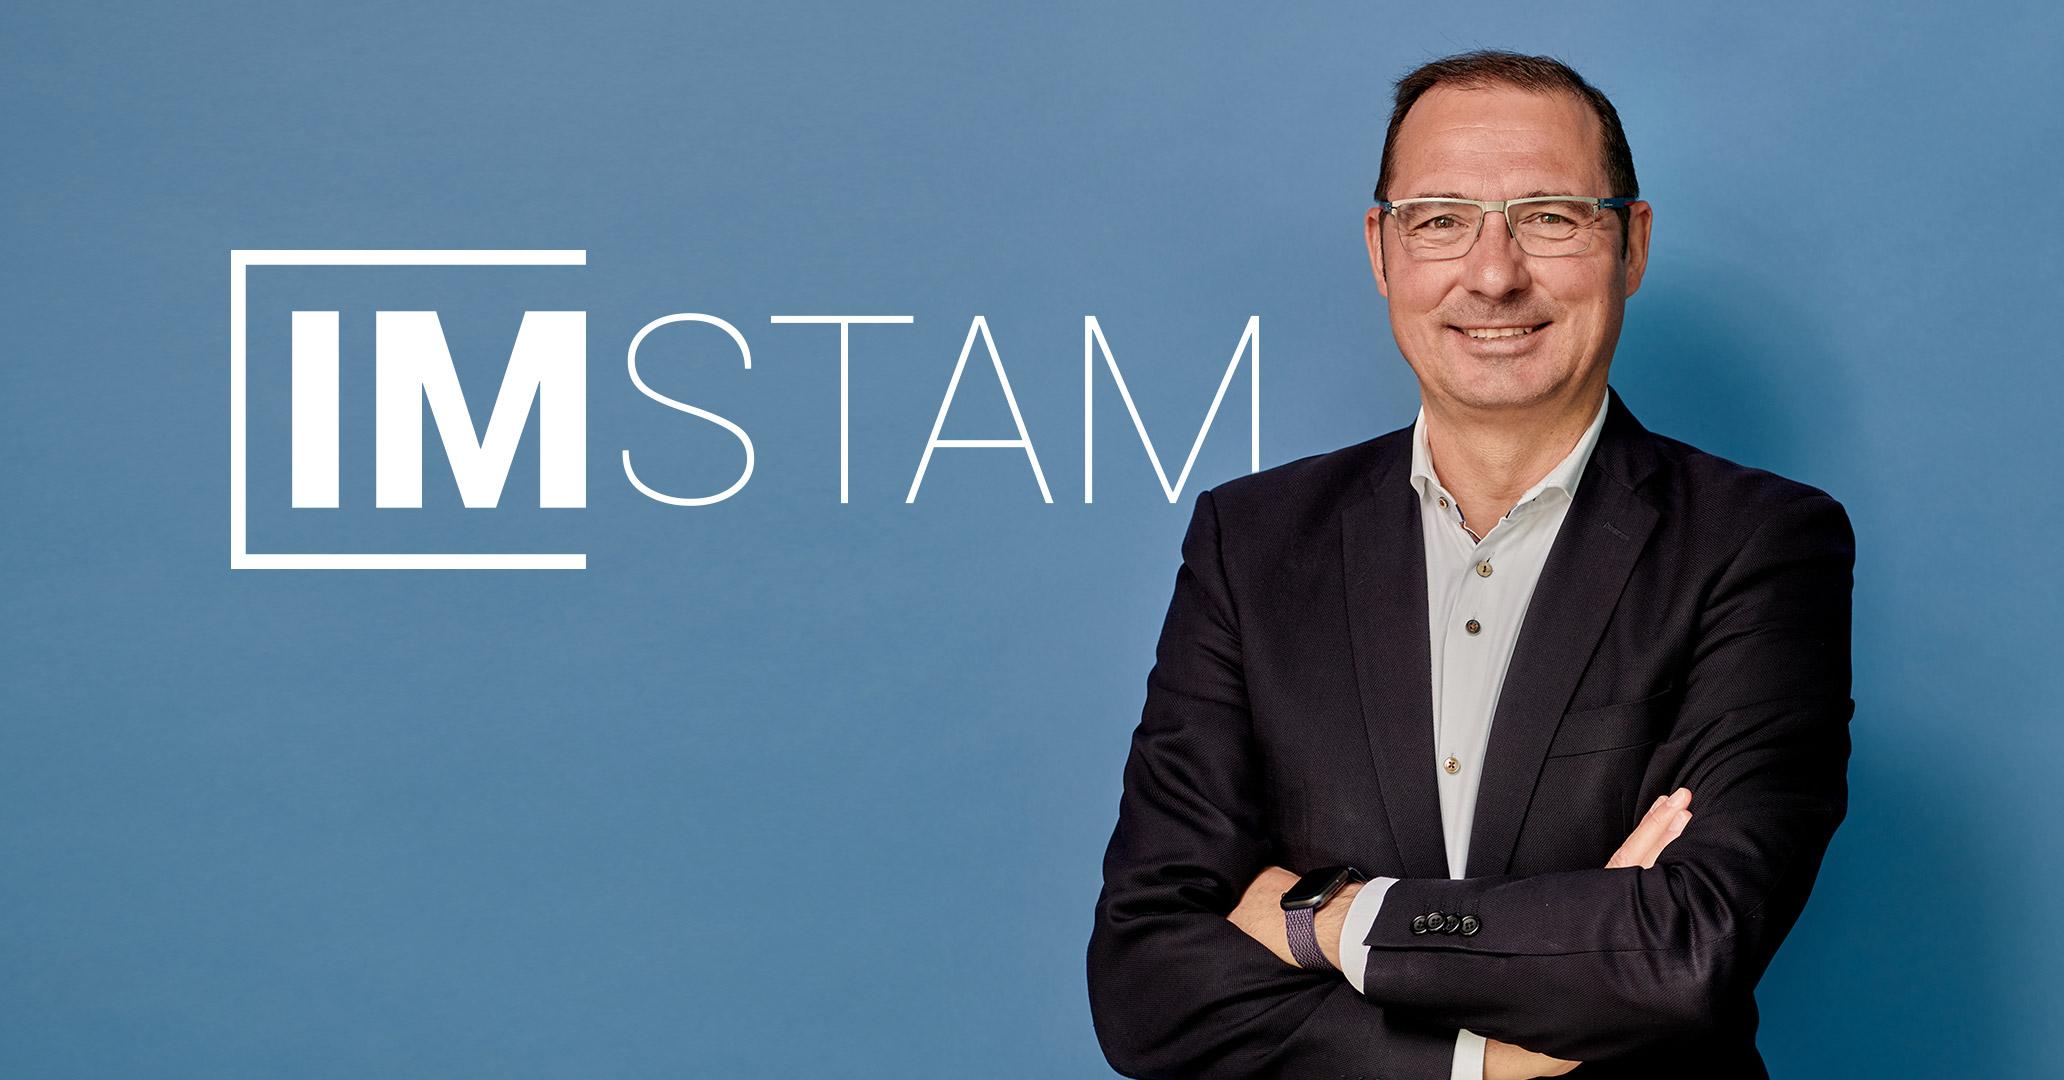 teamElgato News – IMSTAM